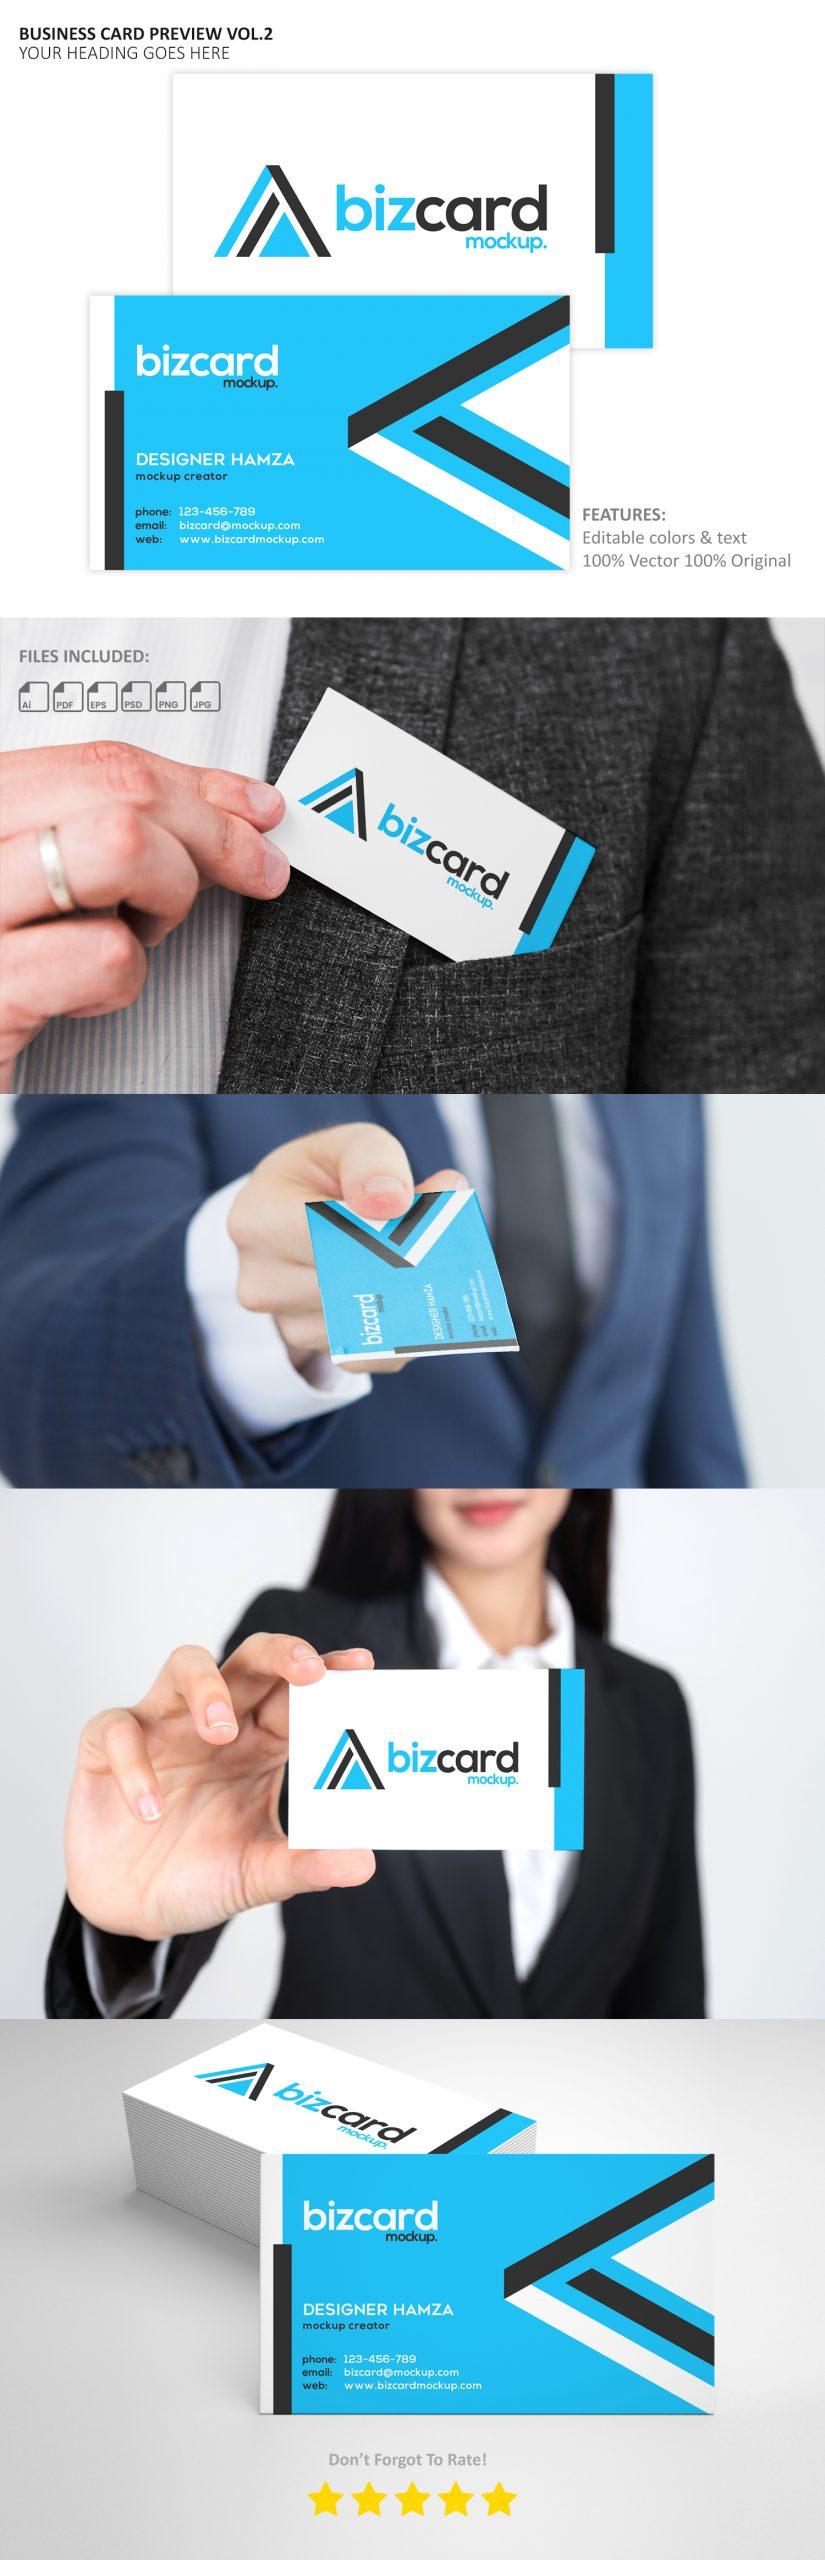 Free Business Card Mockup Generator Download